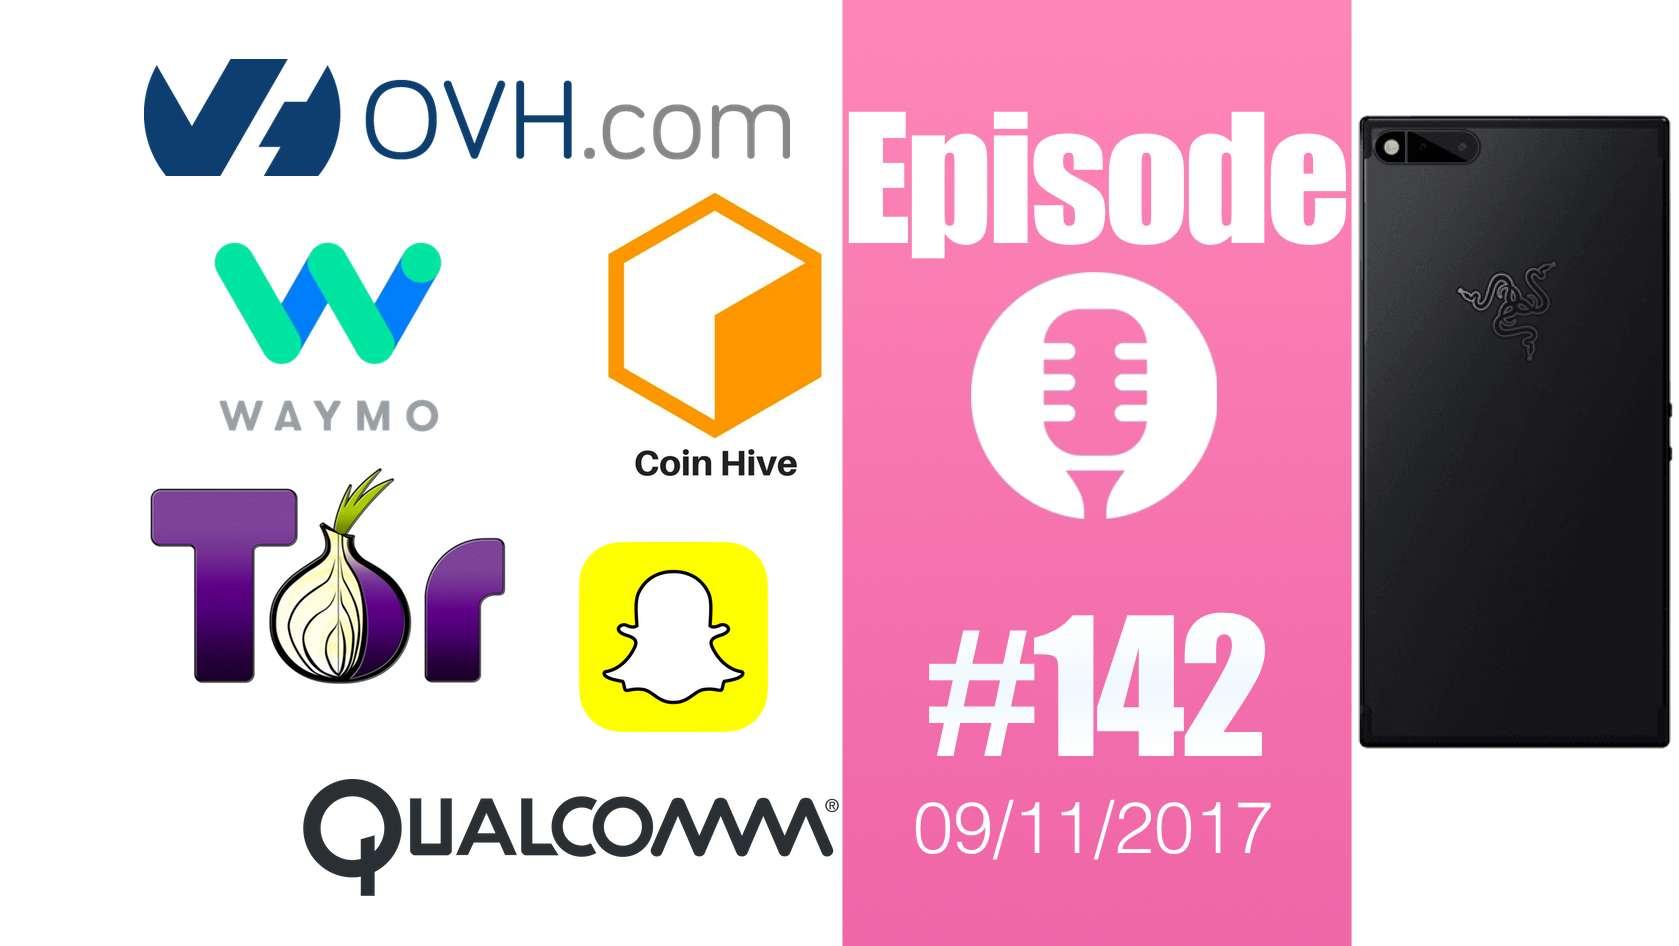 #142: OVH en panne, Waymo, Coinhive, Razer Phone, Mantistek, Twitter, Facebook, Pixel 2 XL,…